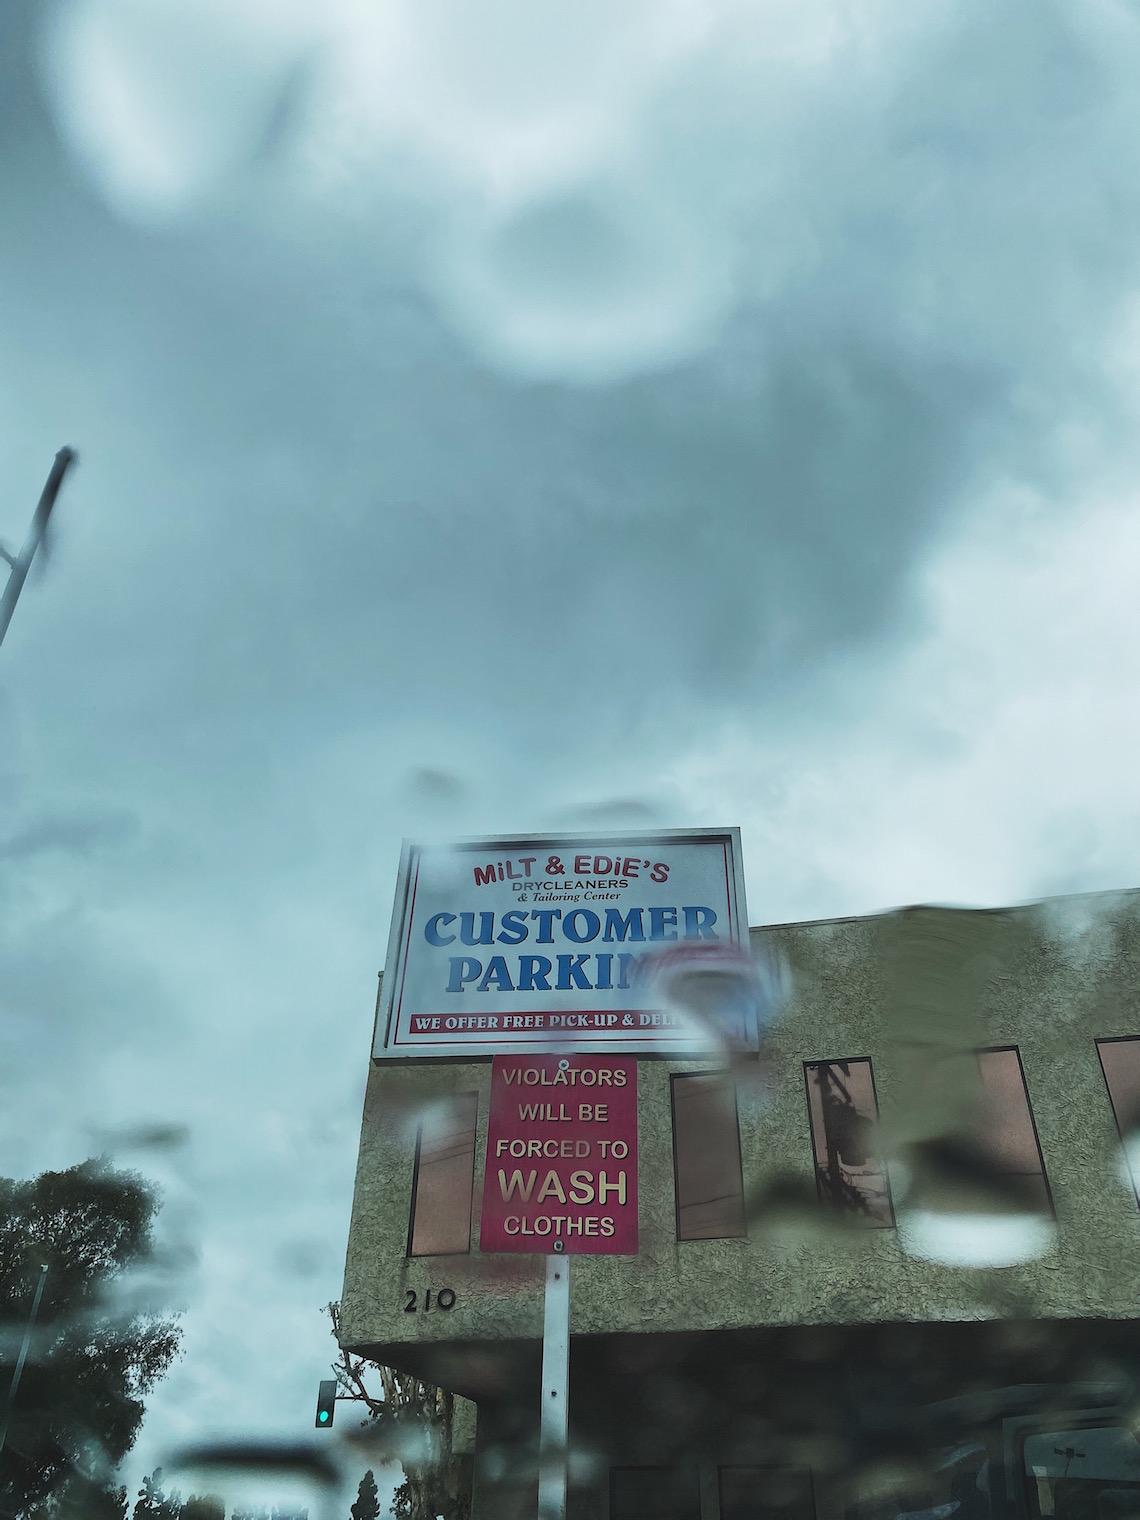 milt & eddies drycleaning-burbank-rain on windshield